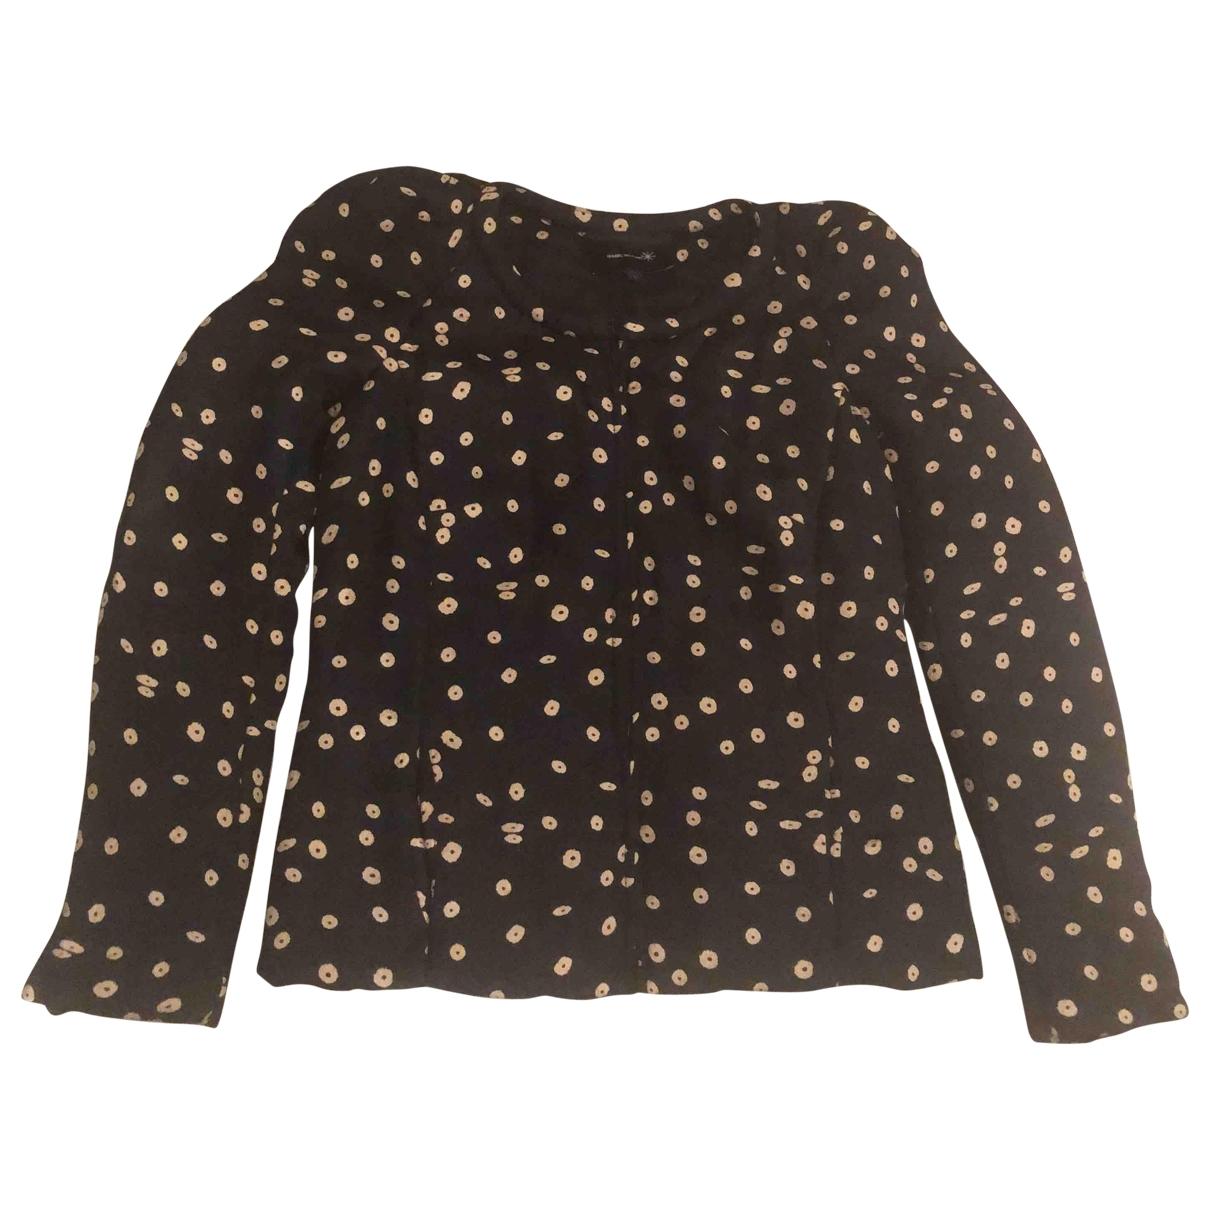 Isabel Marant \N Black Silk jacket for Women 36 FR